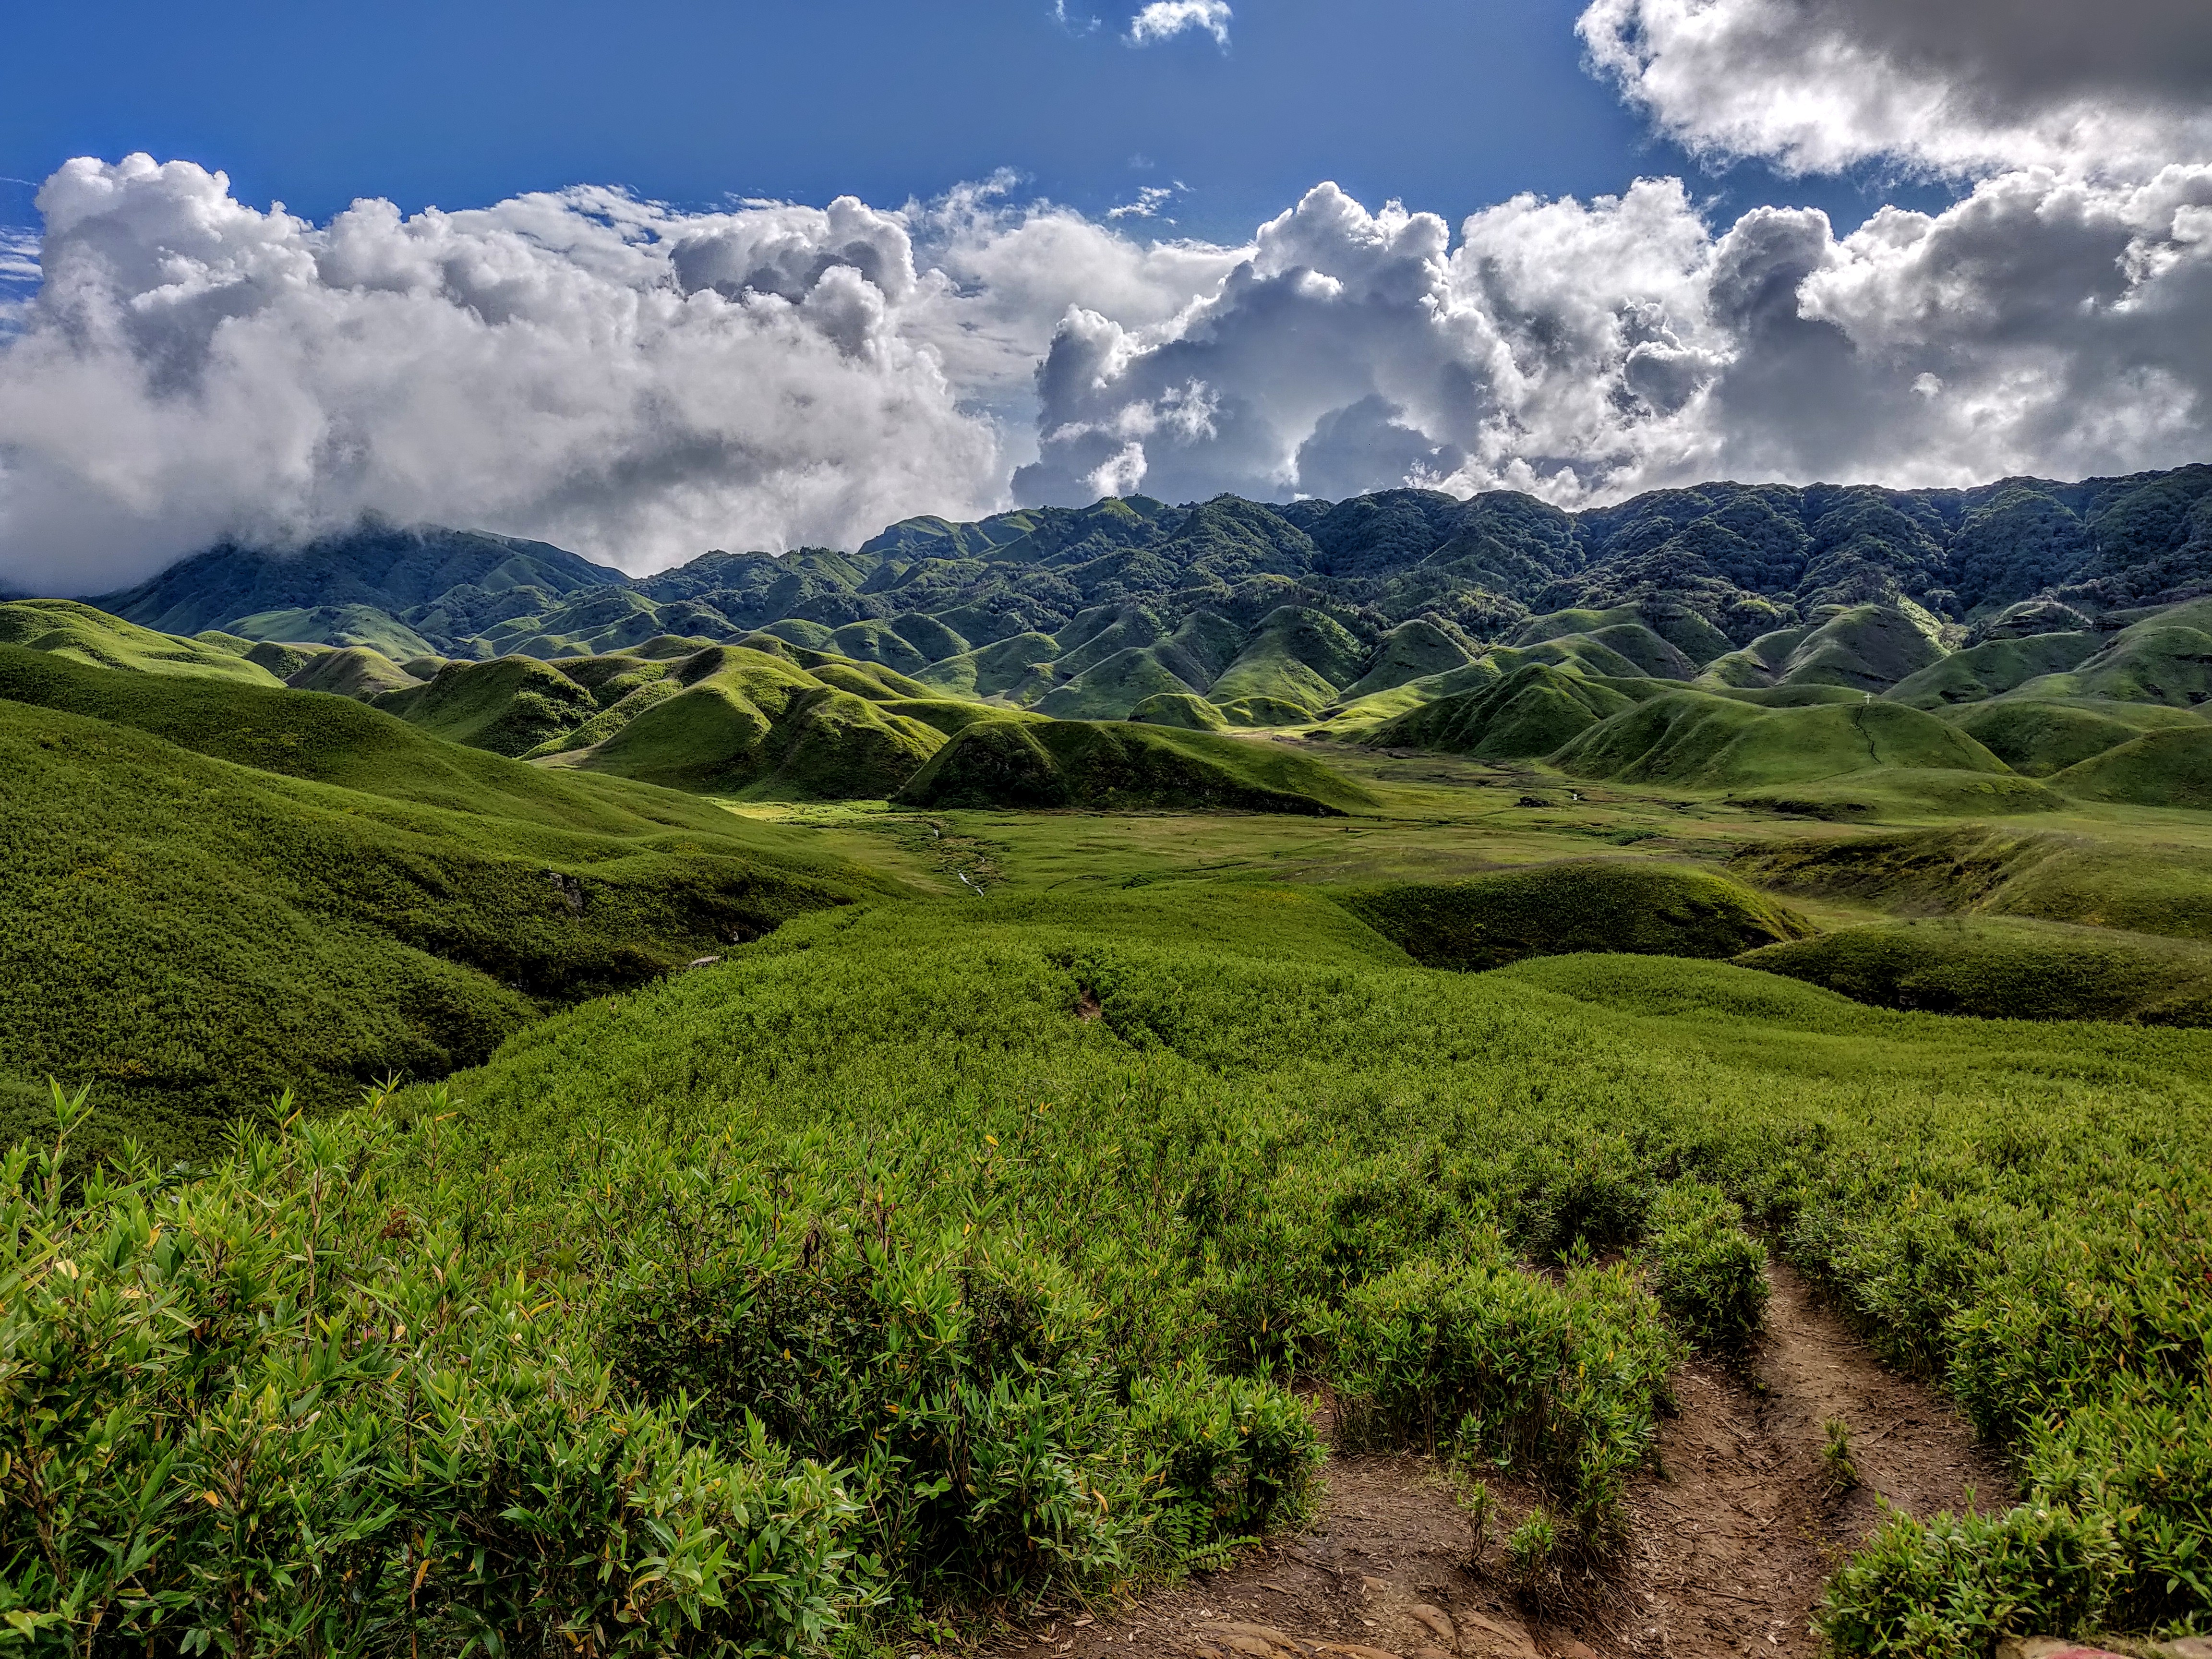 trekking in Nagaland